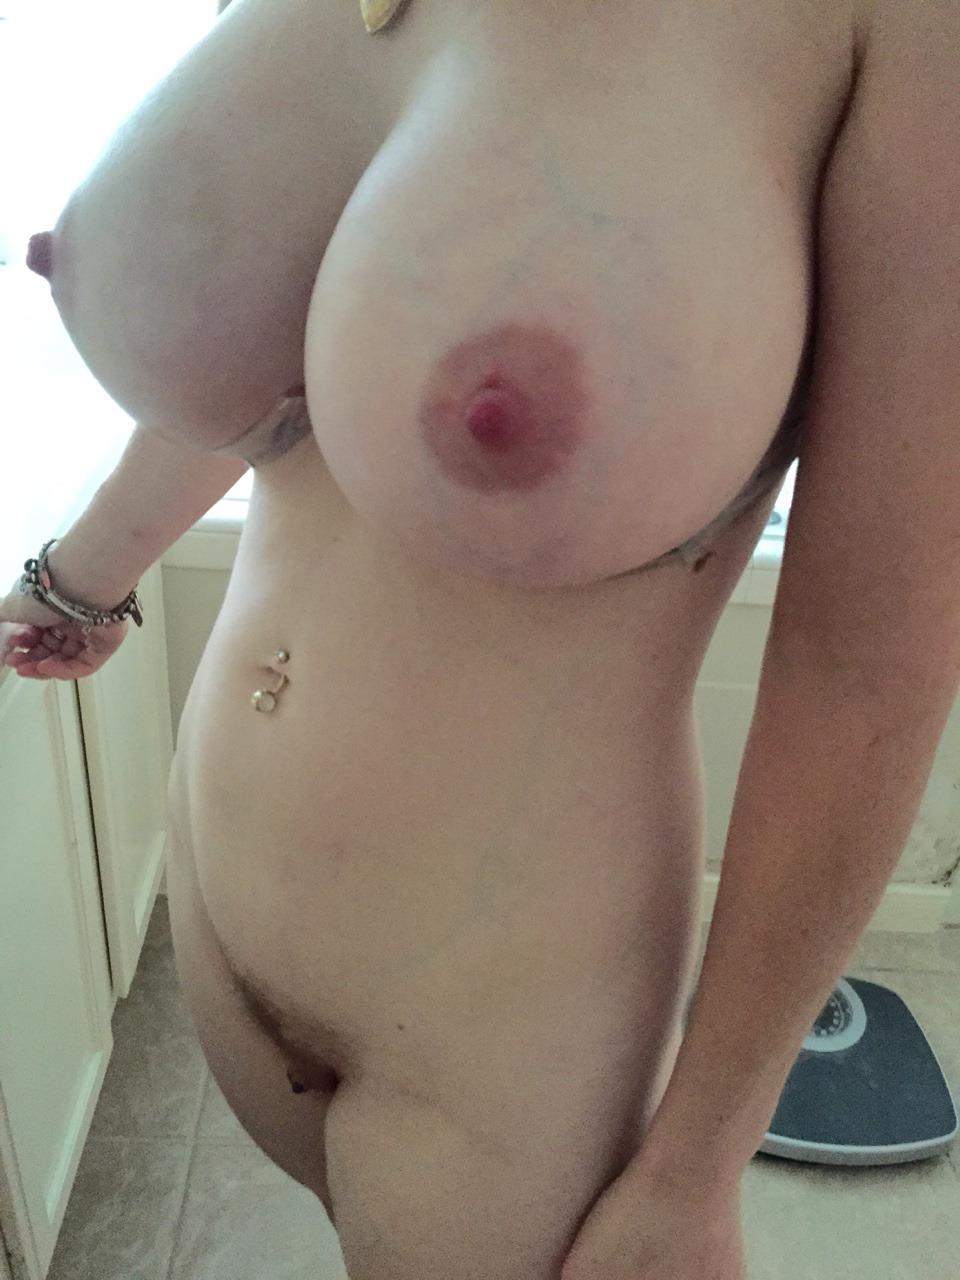 Young Fat Ass Russian Girl Jenny Enjoys Hard Anal Sex photo 3